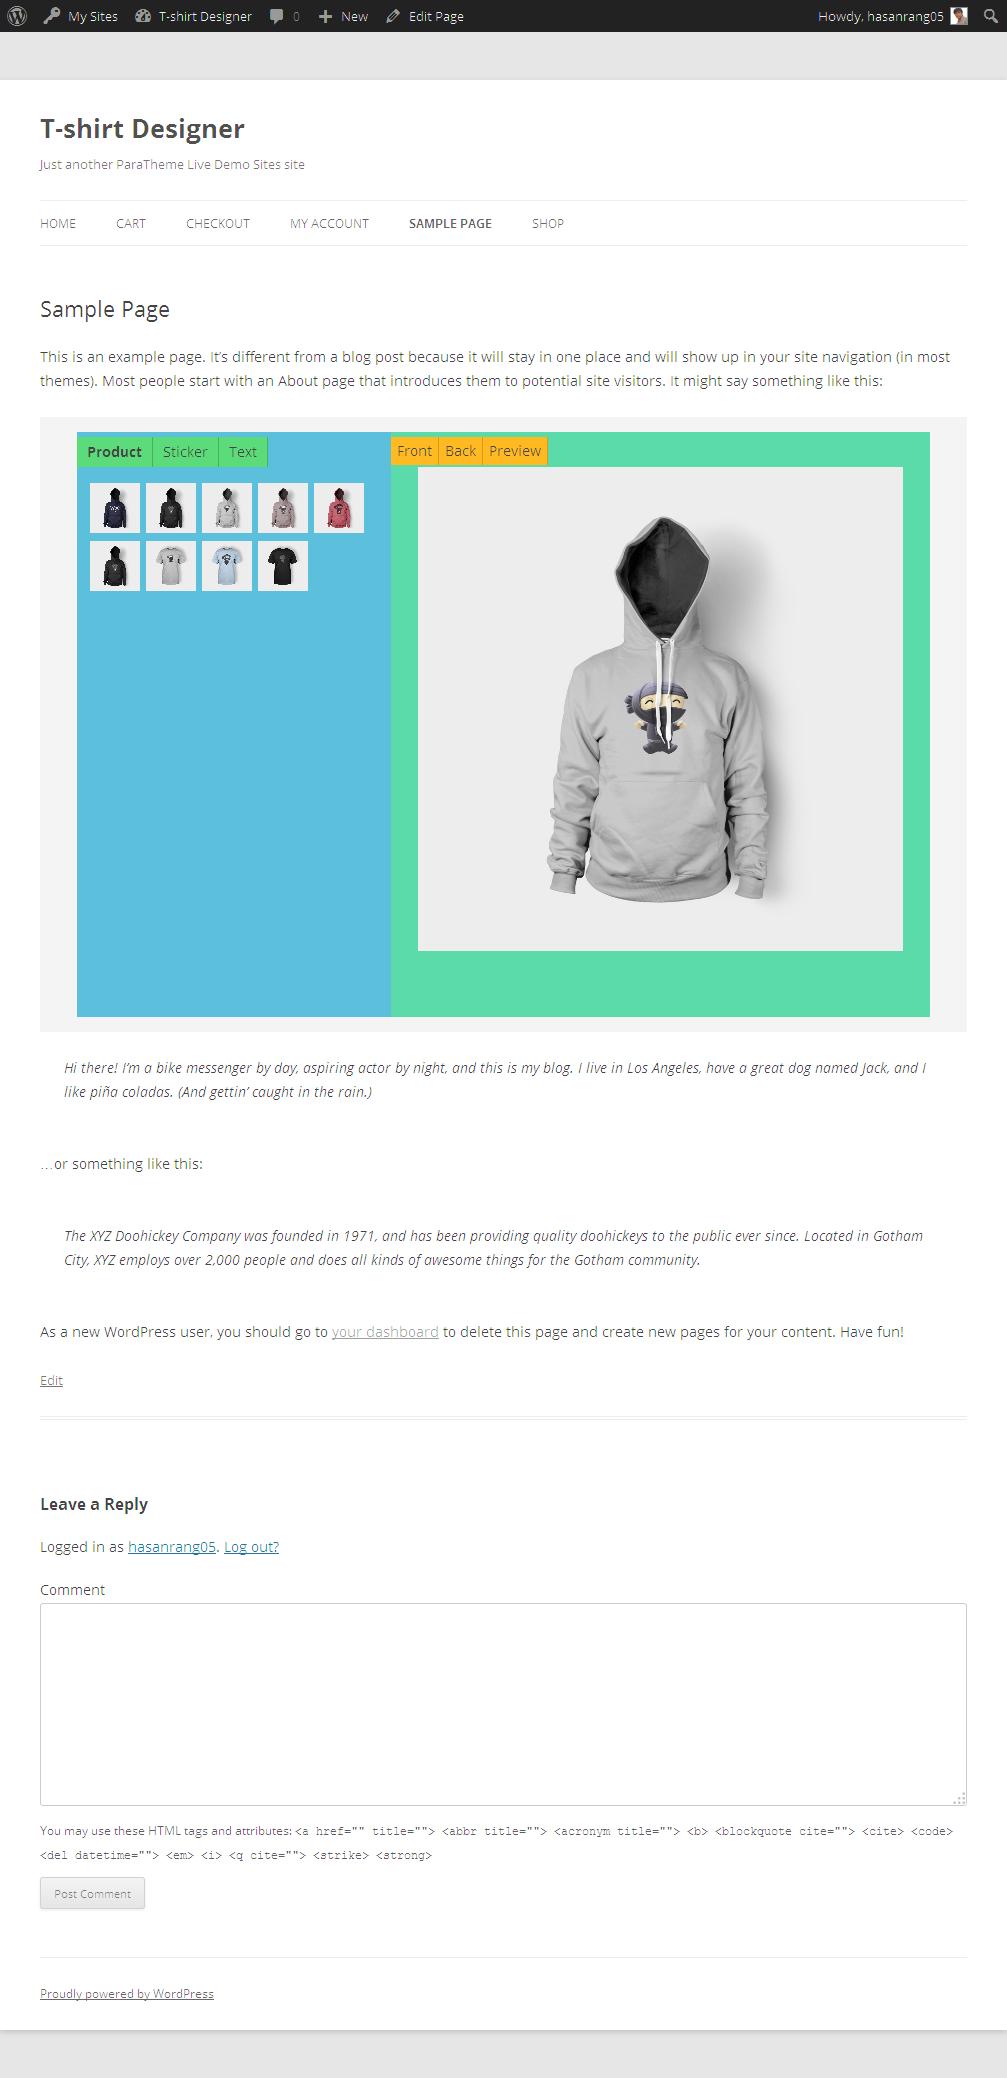 Shirt design wordpress plugin - Screenshots